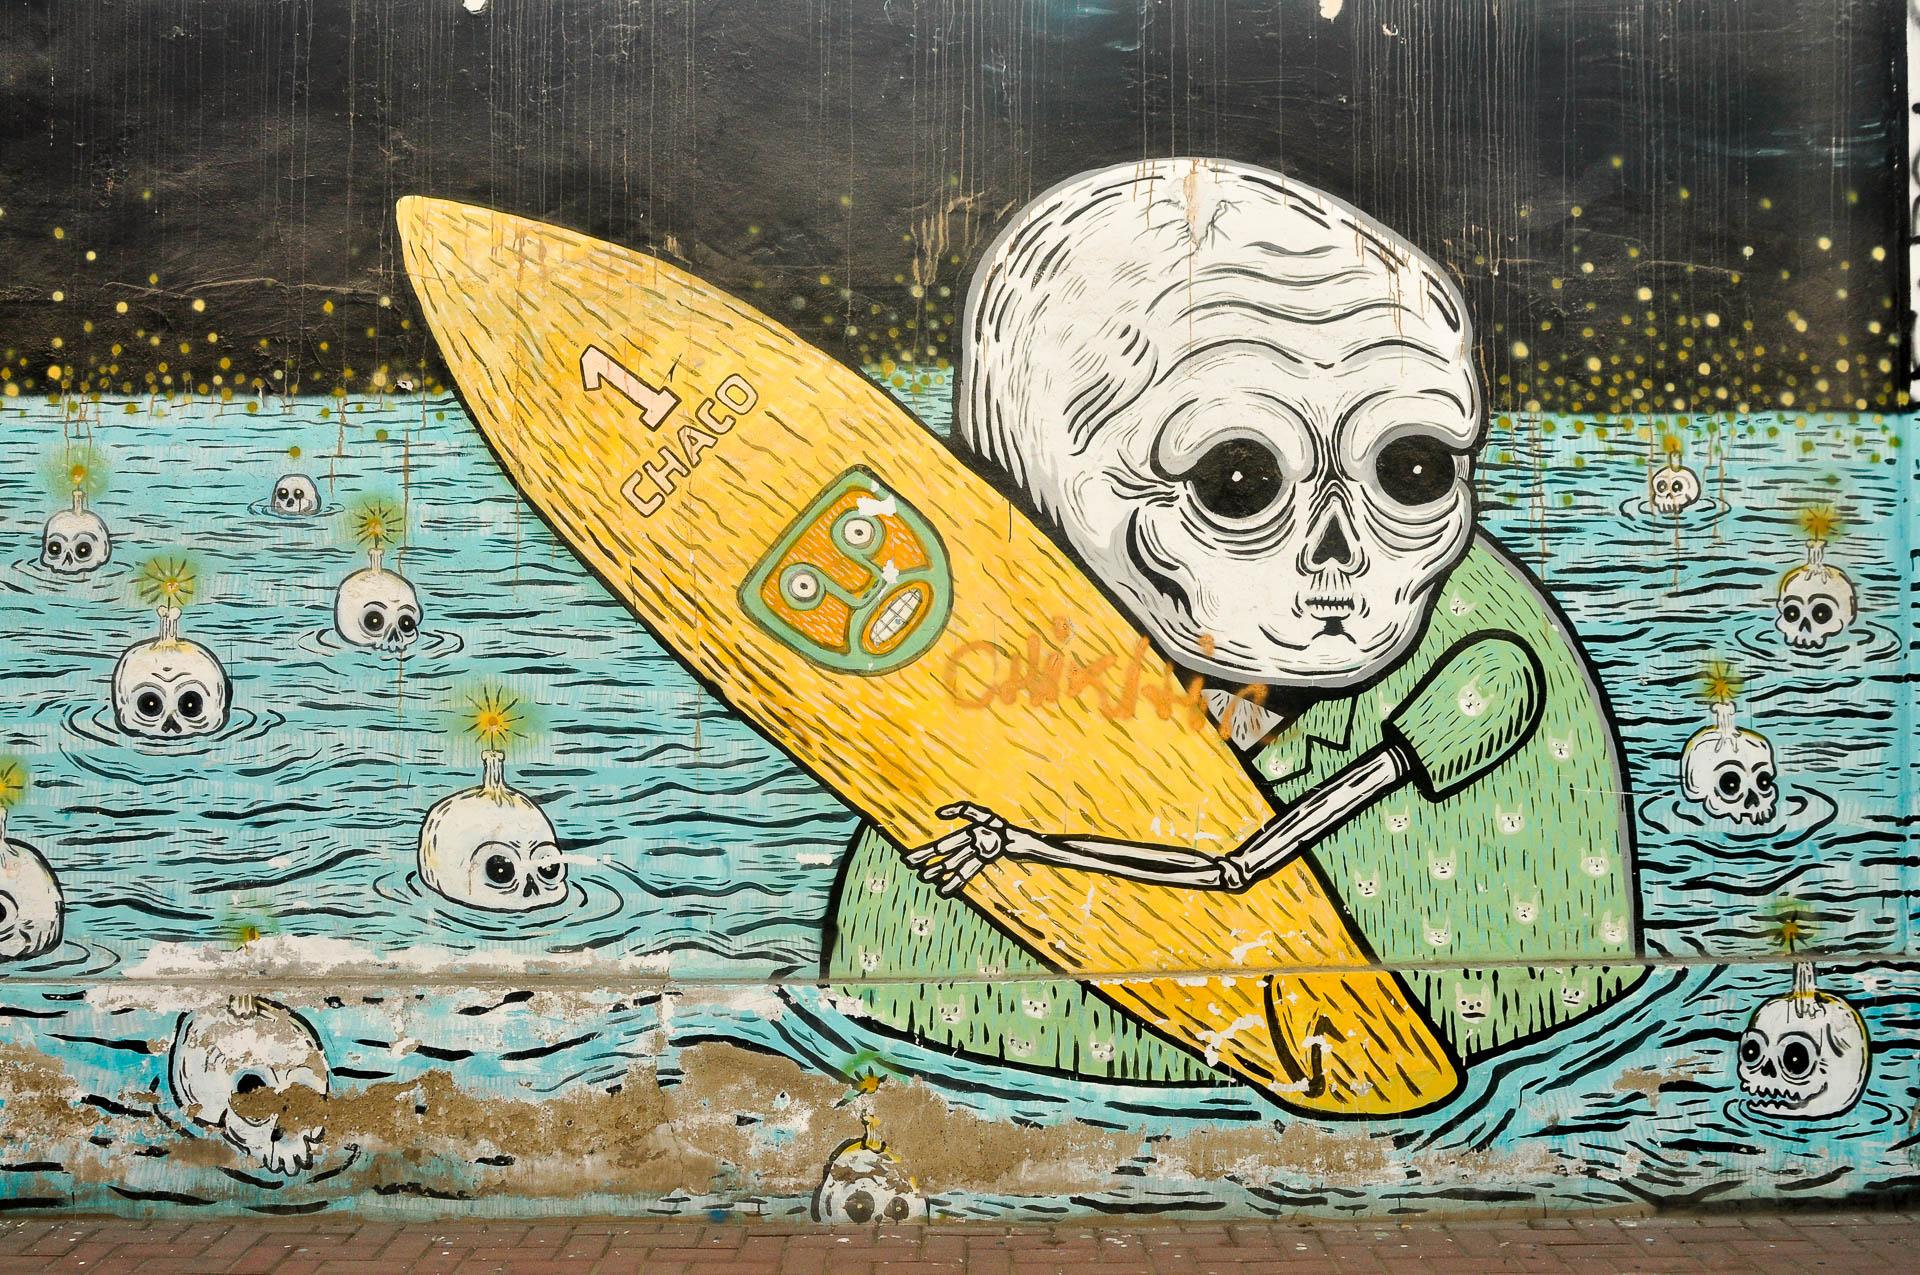 Huanchaco graff - Les globe blogueurs - blog voyage nature